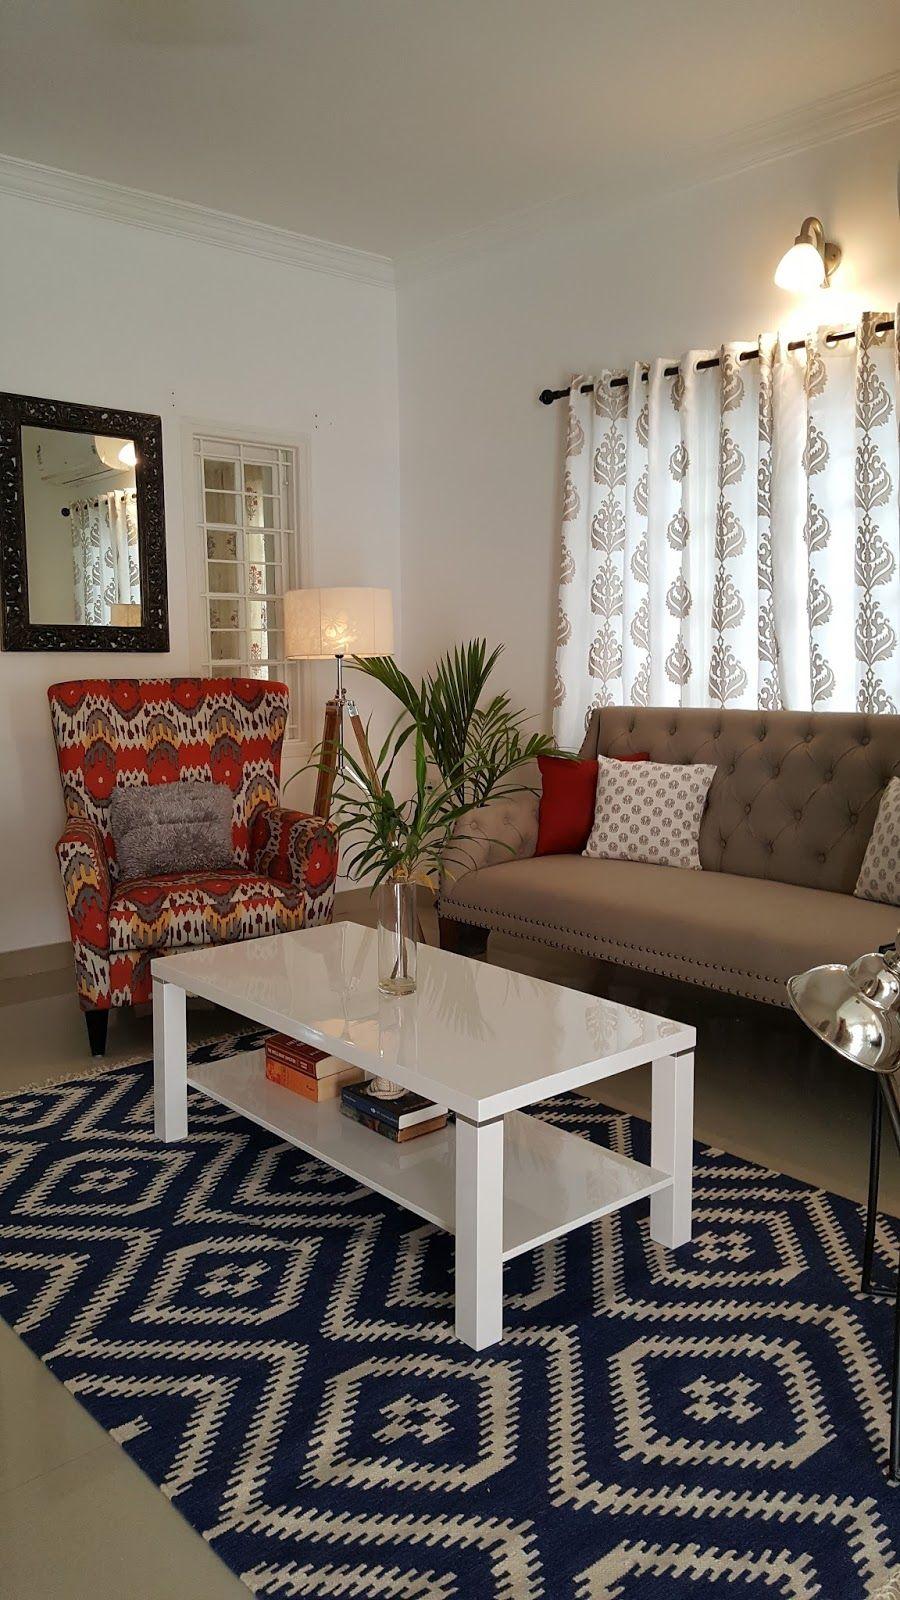 D'life home interiors kochi kerala interior interior designing styling house kerala kochi  home